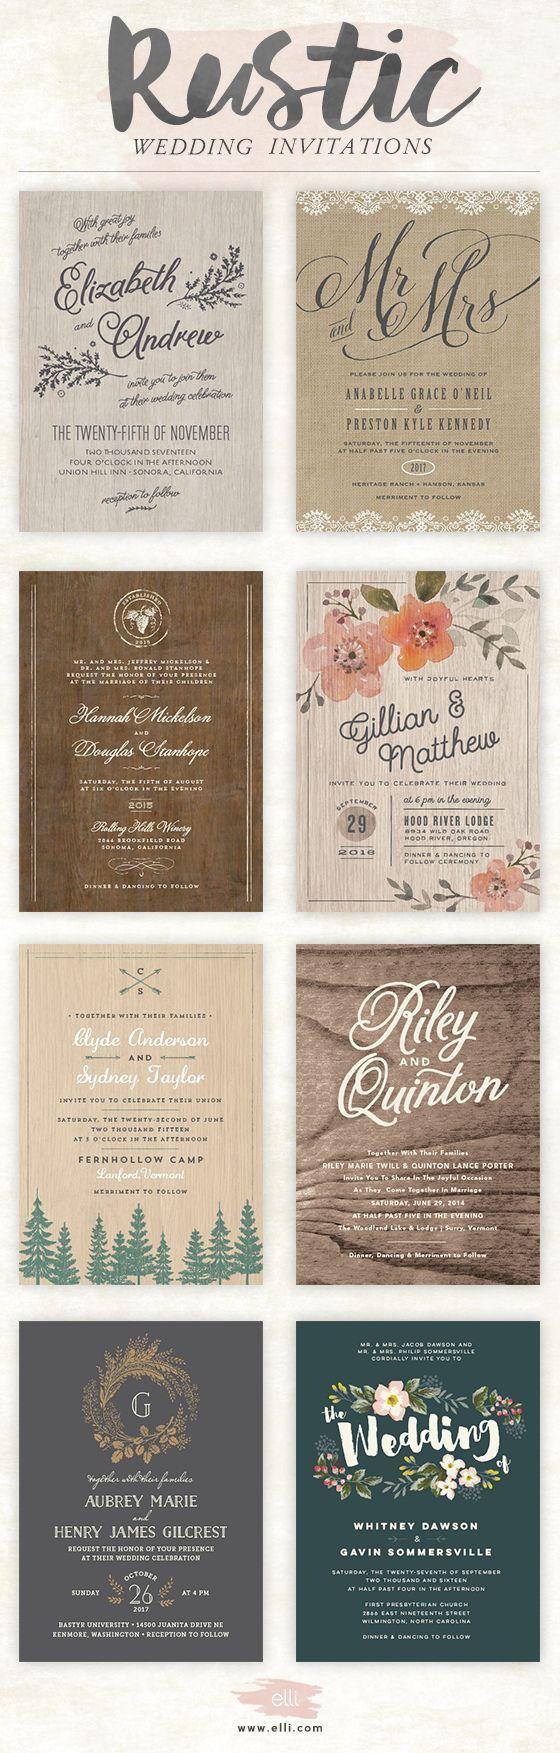 the most unique wedding invitations wedding invitations Rustic wedding invitations Bella Collina Weddings